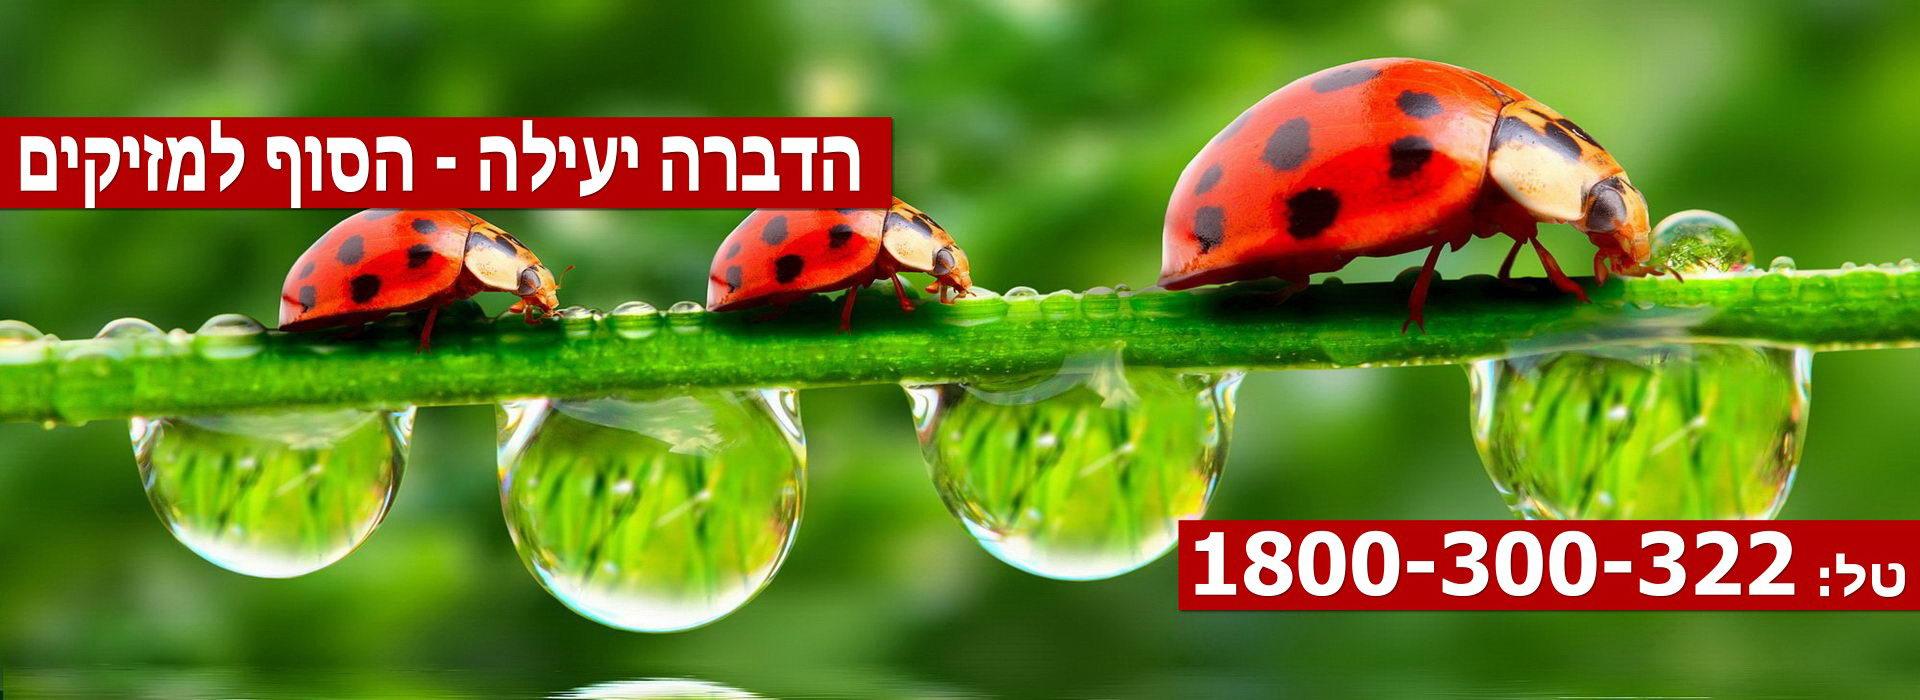 Pest-Control-Haifa-Slider6